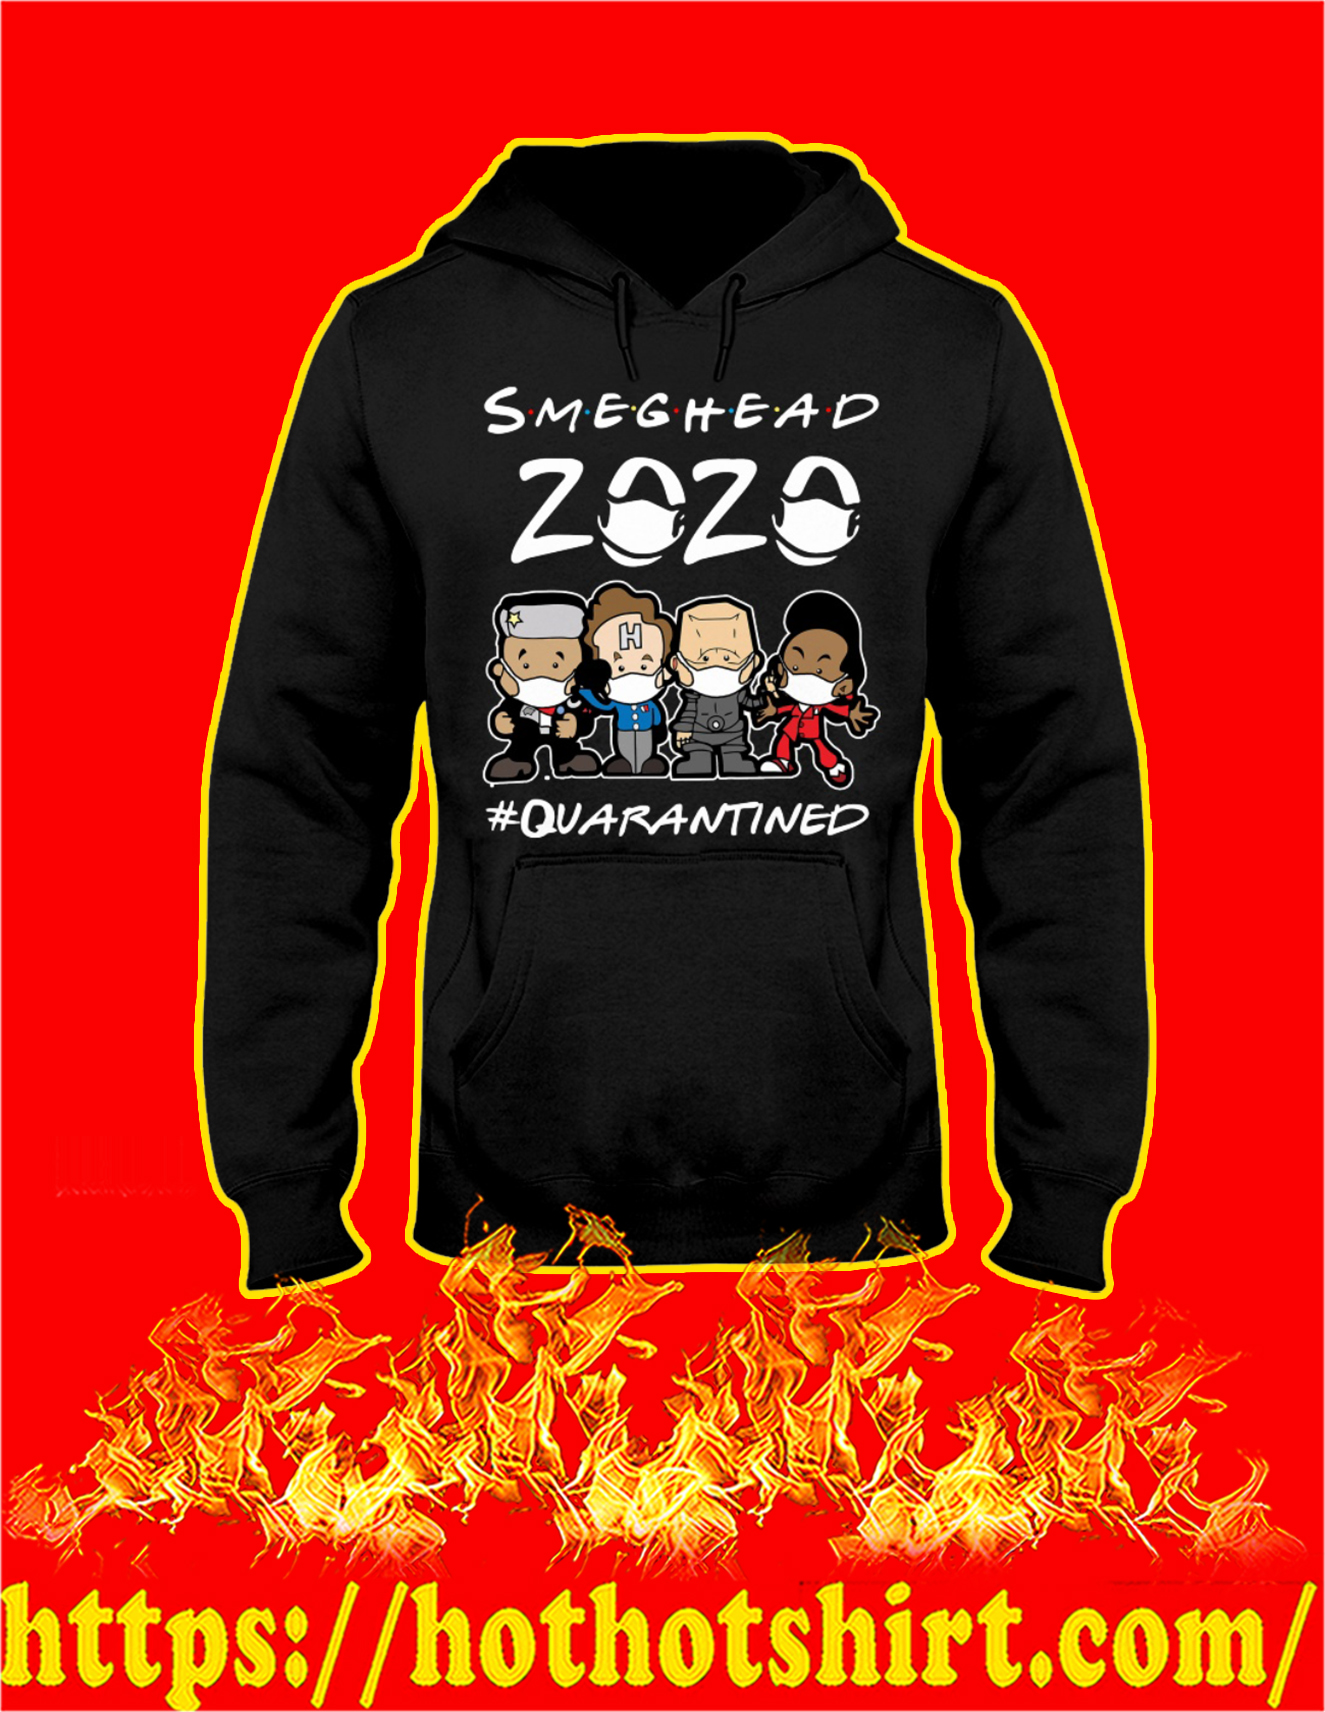 Smeghead 2020 quarantined hoodie